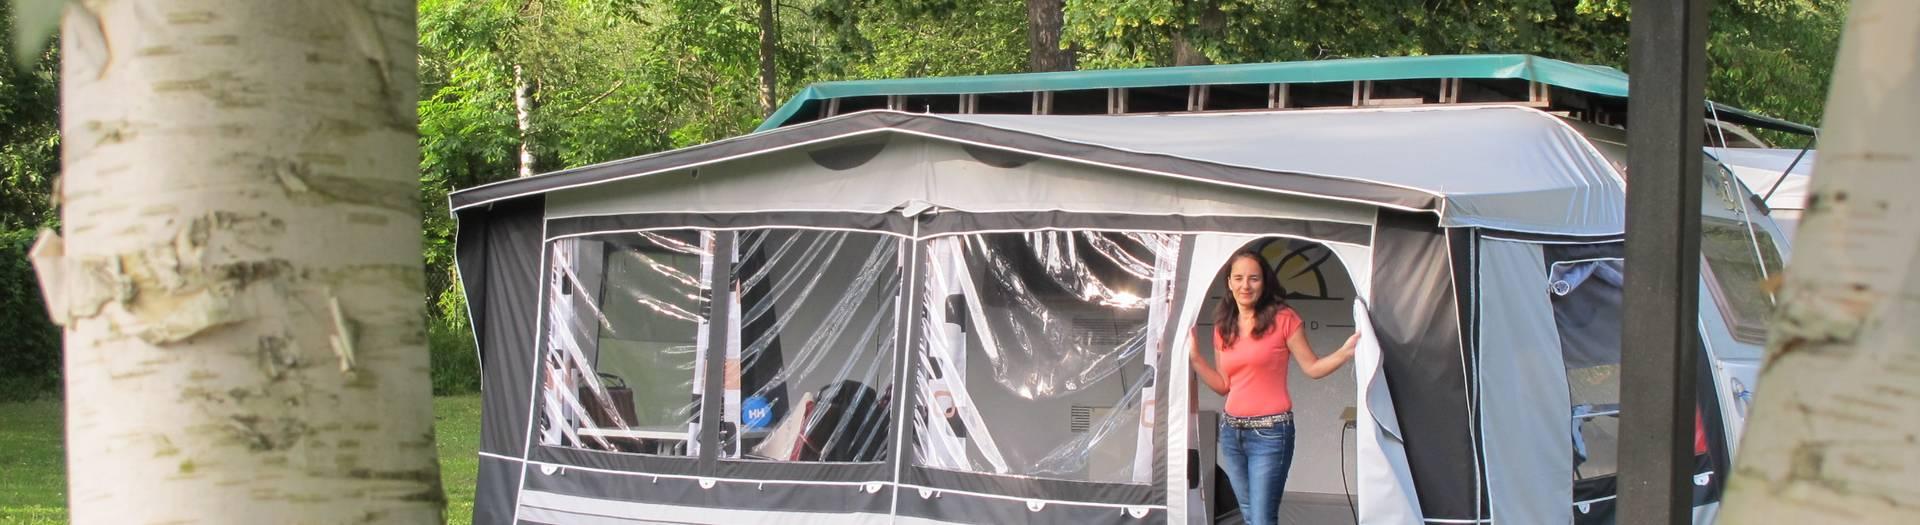 <p>Campingurlaub Ute Zaworka</p>